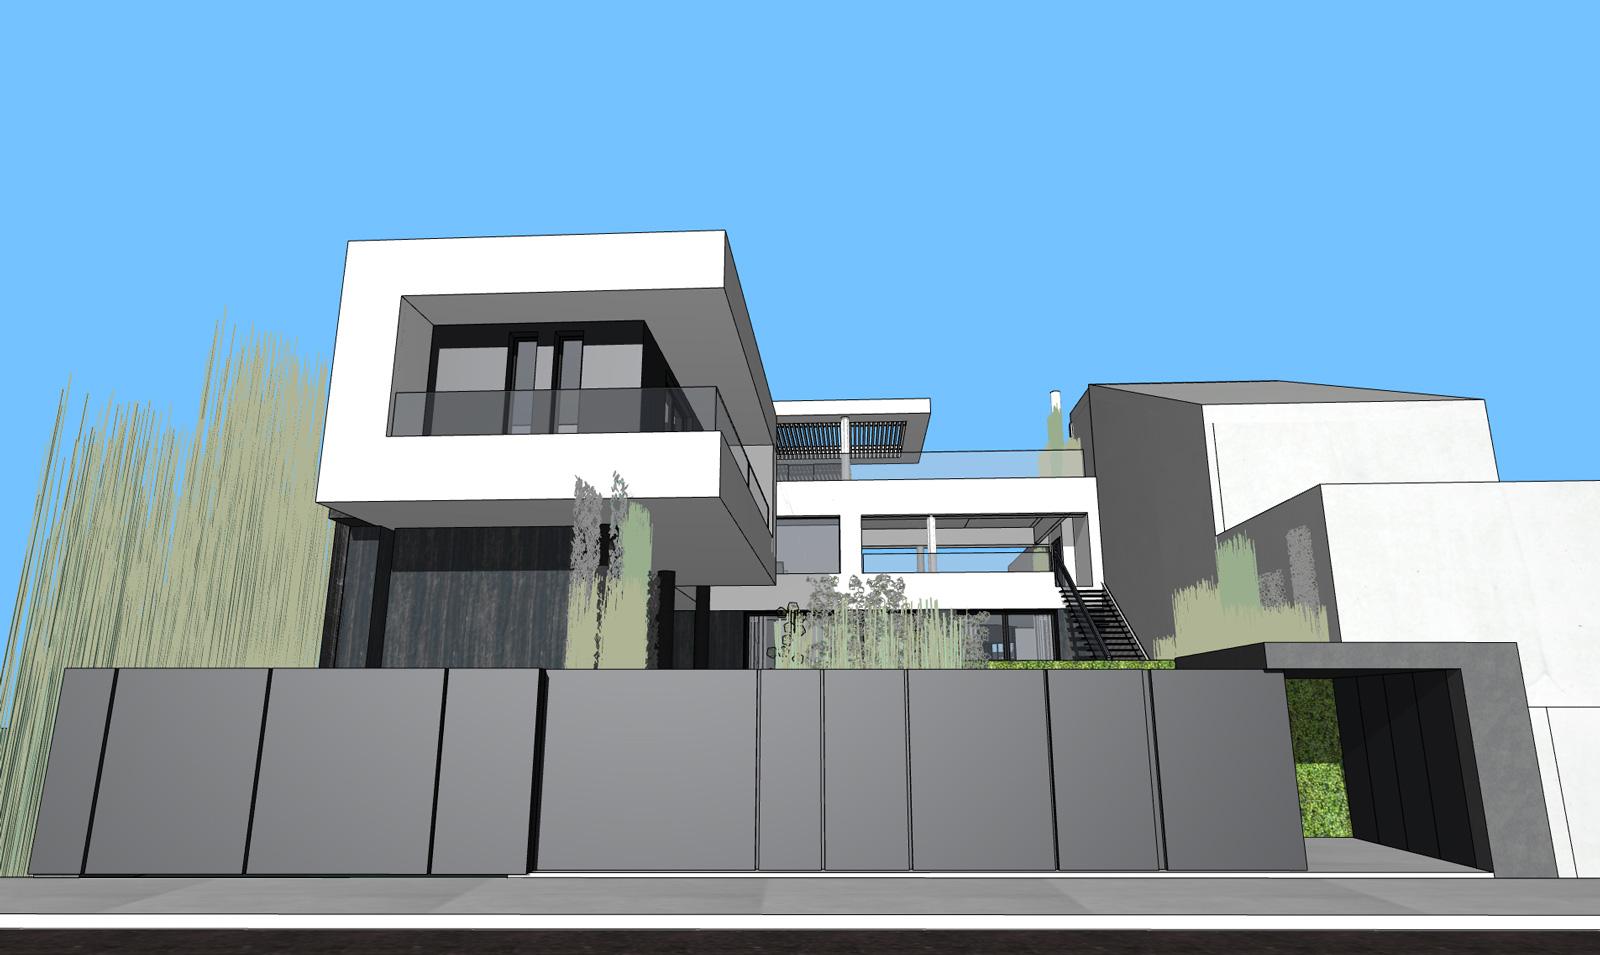 ANO VOULA – 2 FLOOR HOUSE